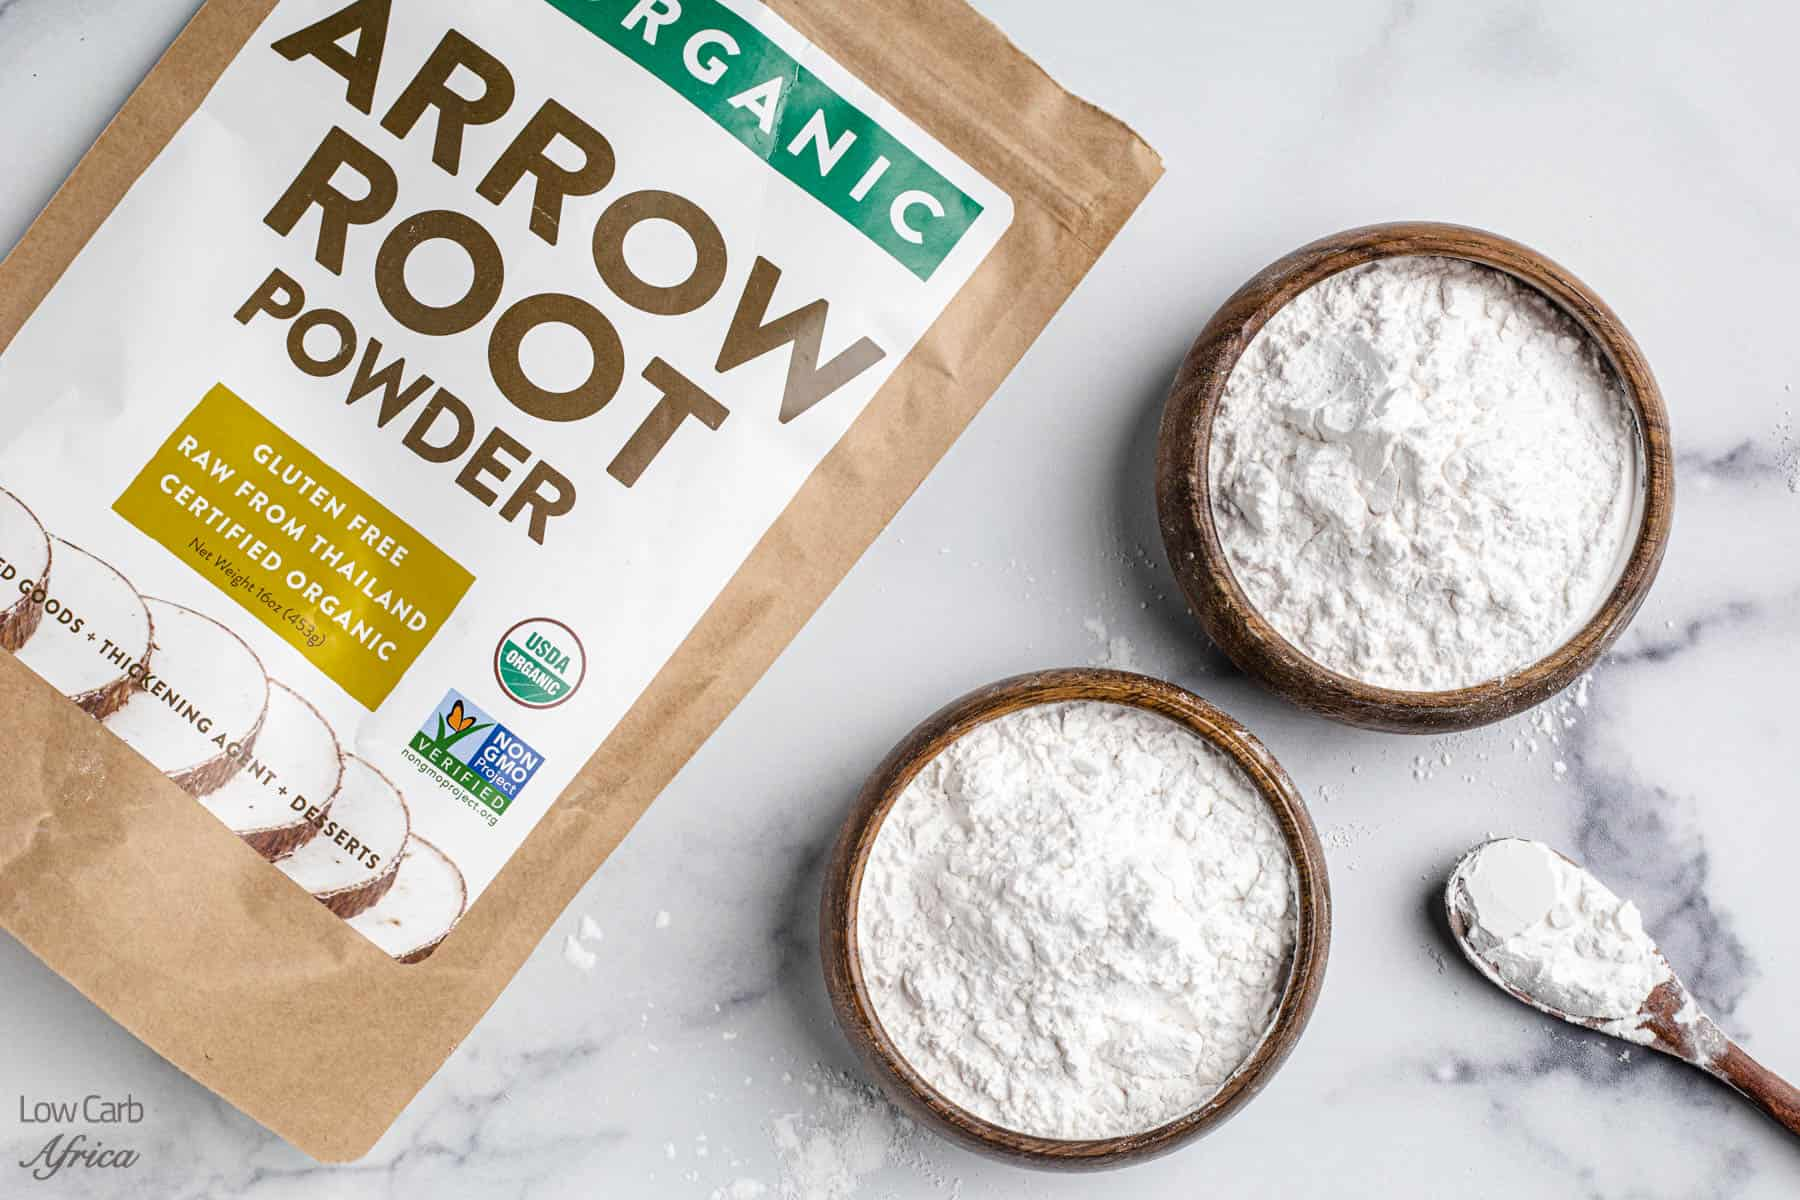 arrowroot powder in a bowl